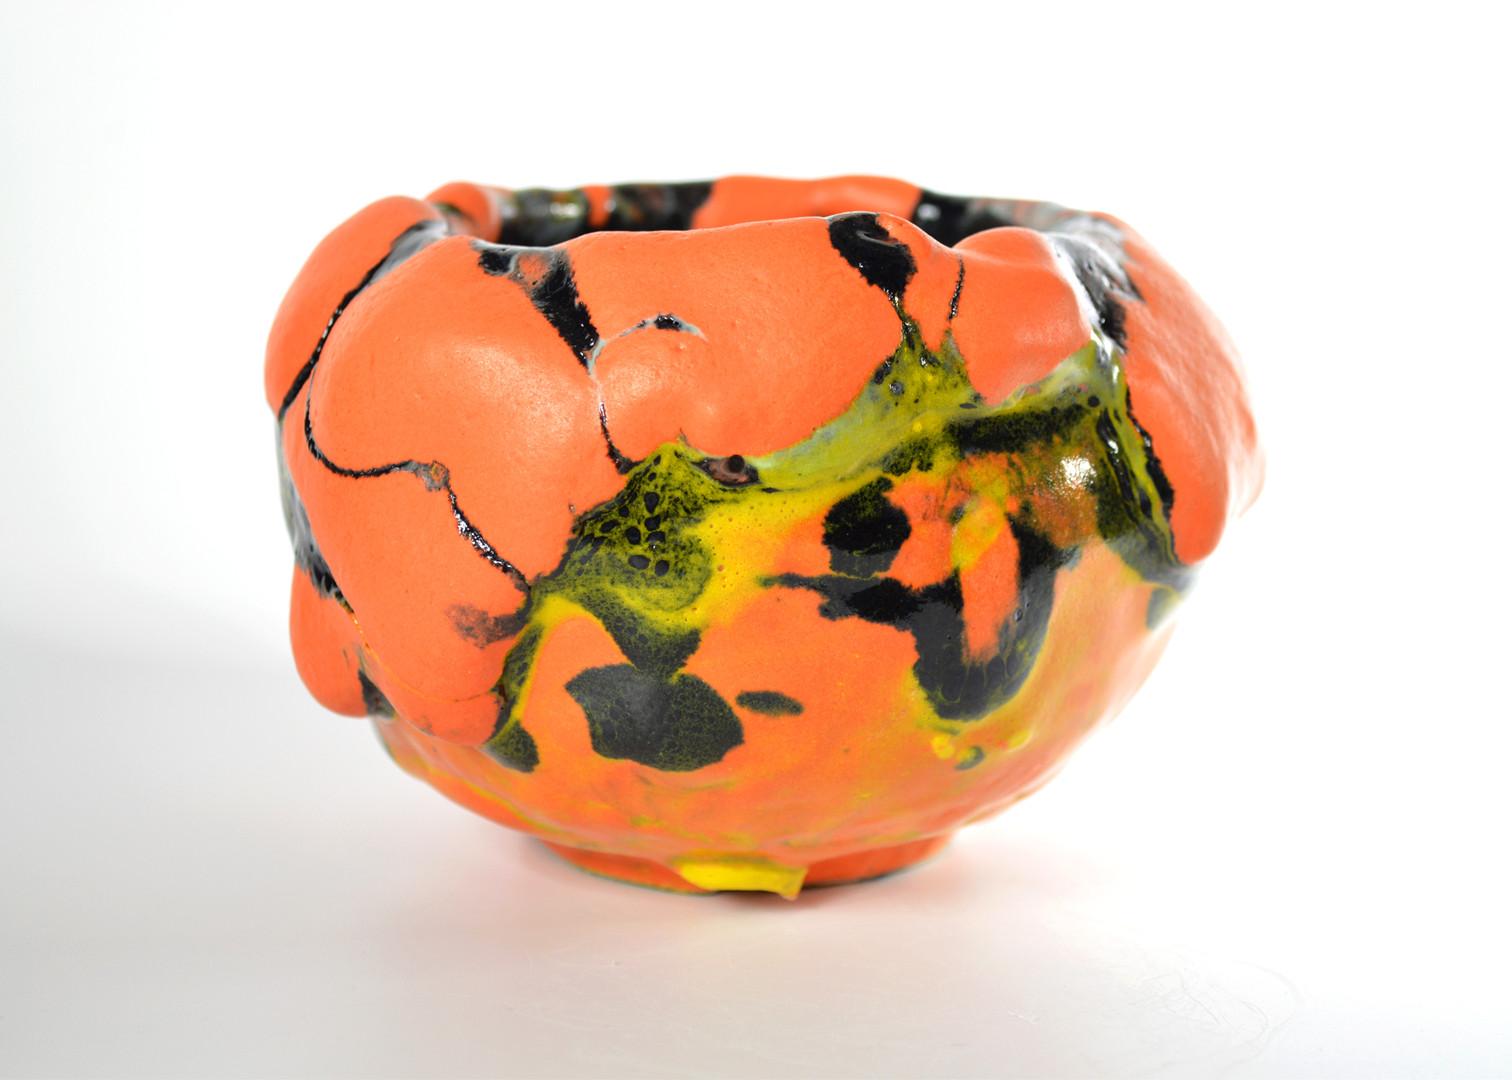 Pam-Space-Dog-Moon-Jar-Orange-Black-3.jp